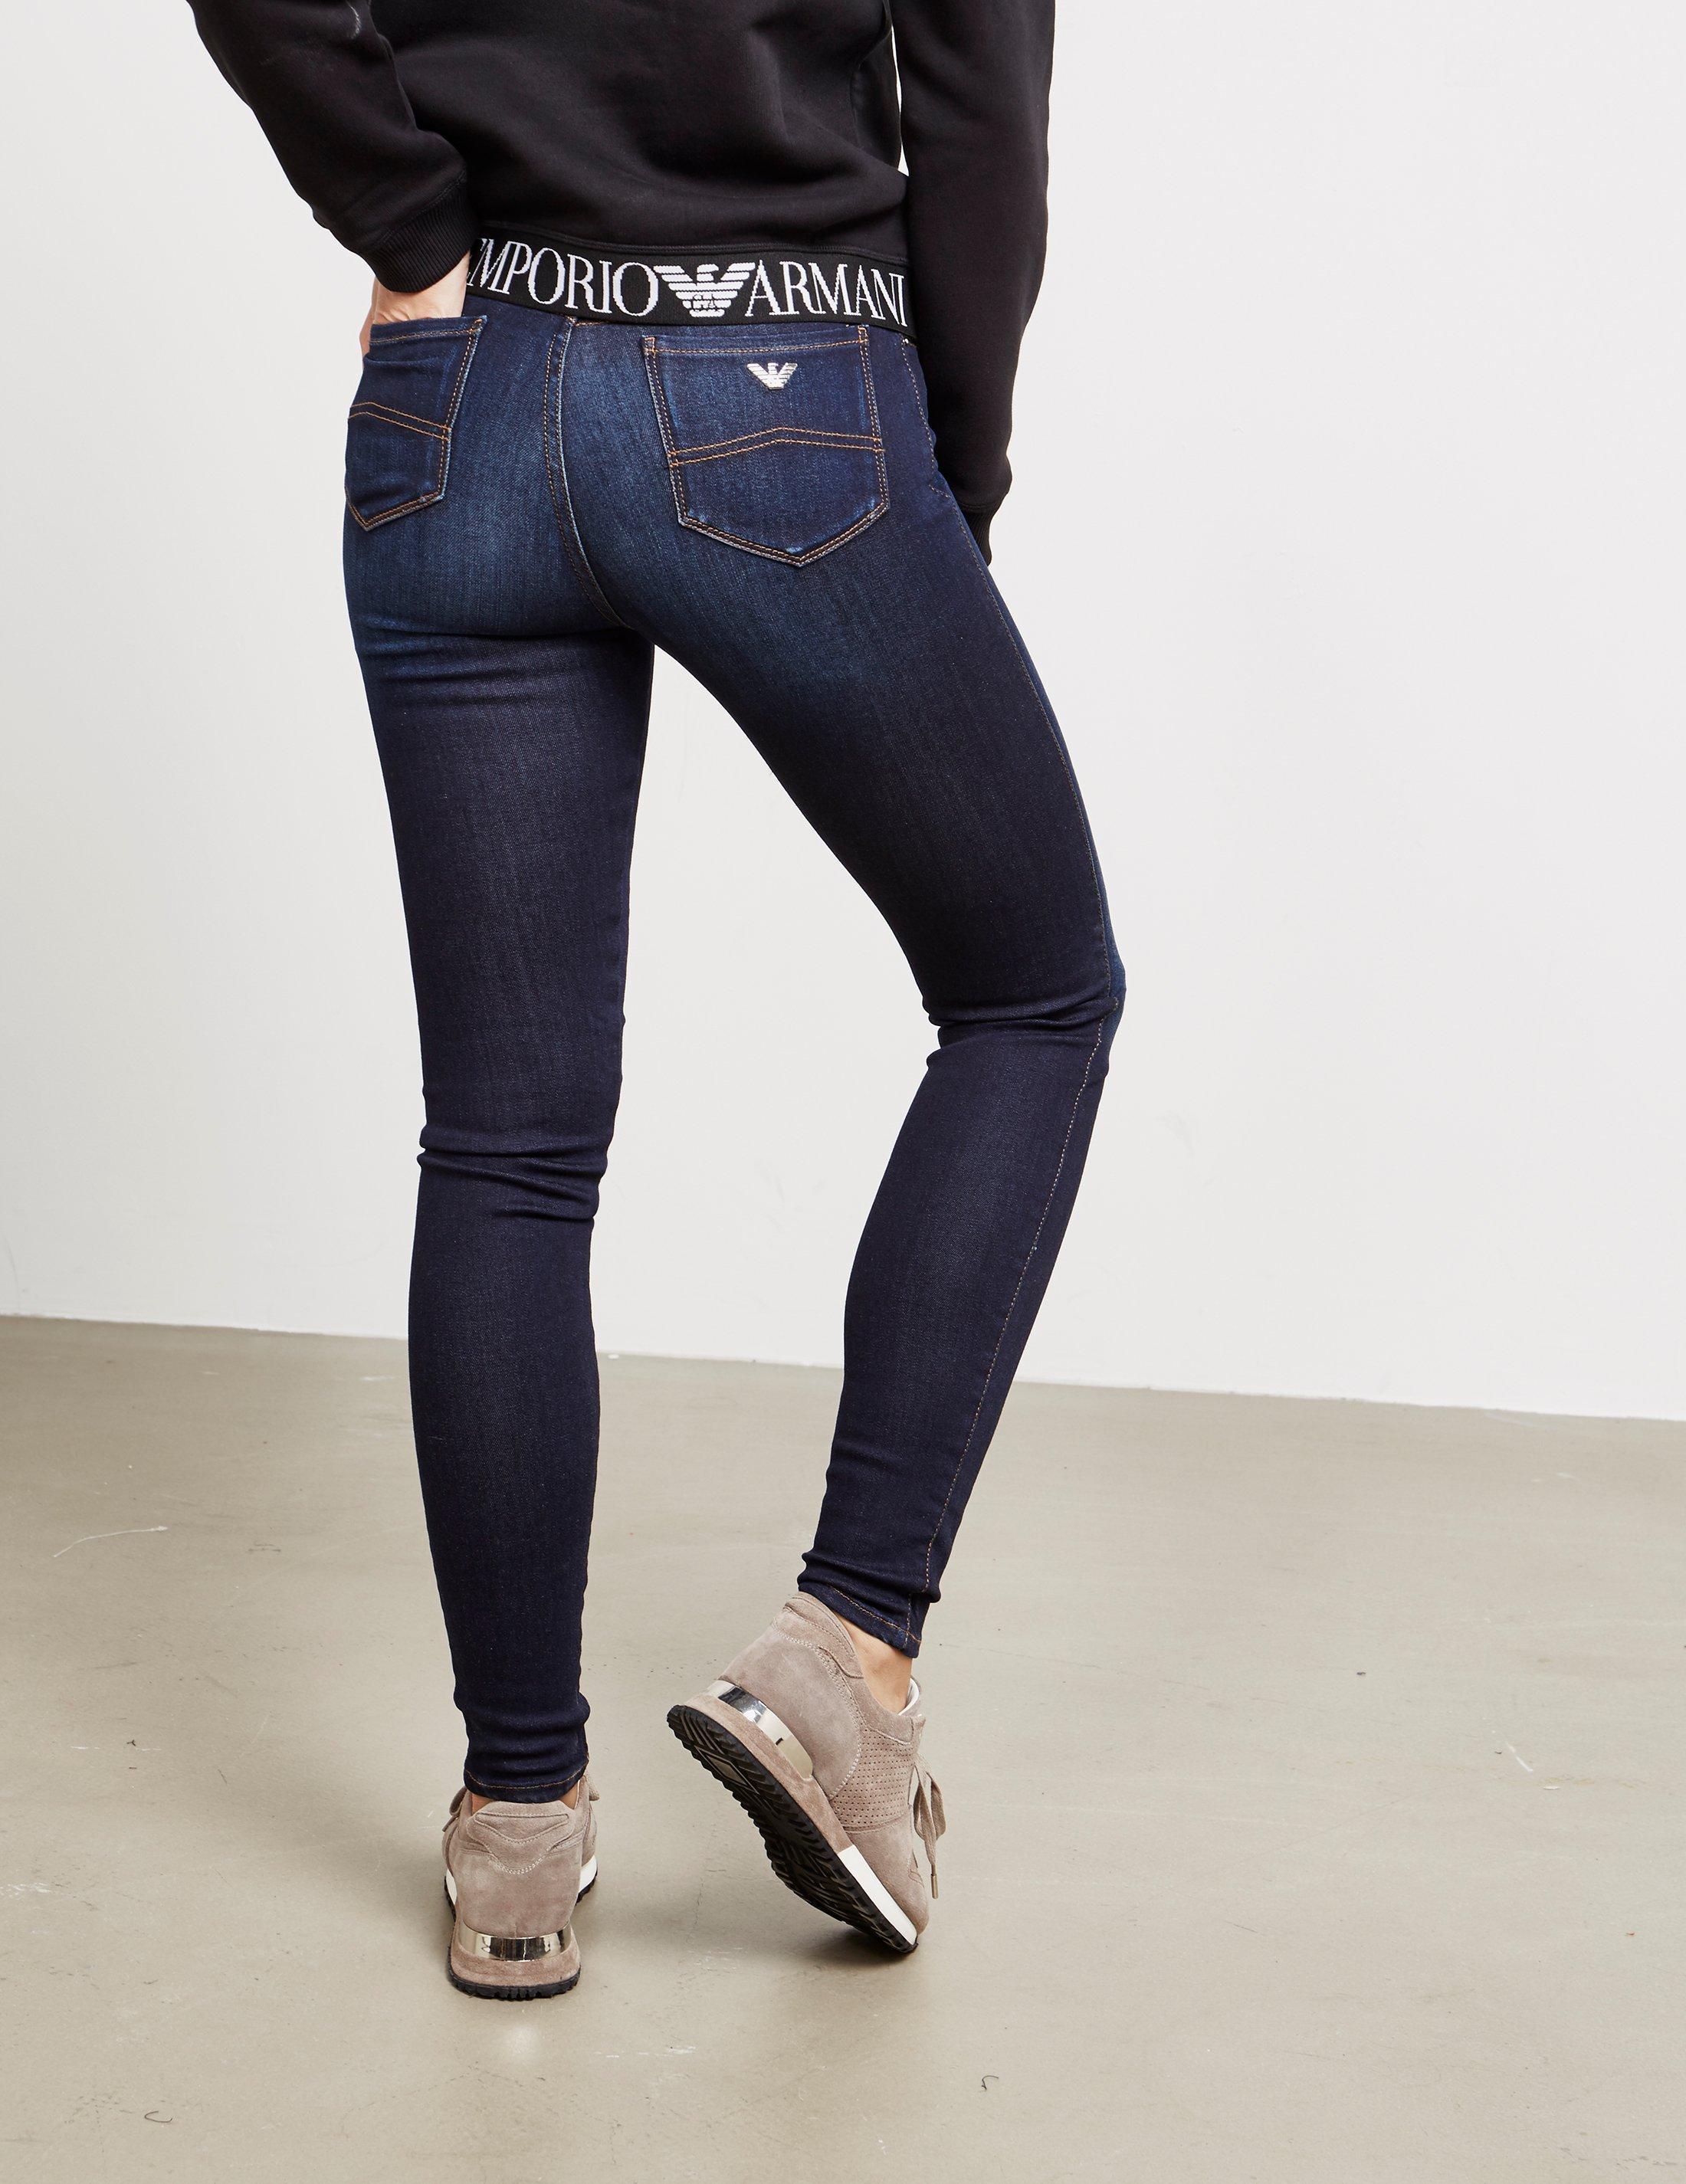 b511bcd7 Emporio Armani Womens Stretch Skinny Jeans Blue